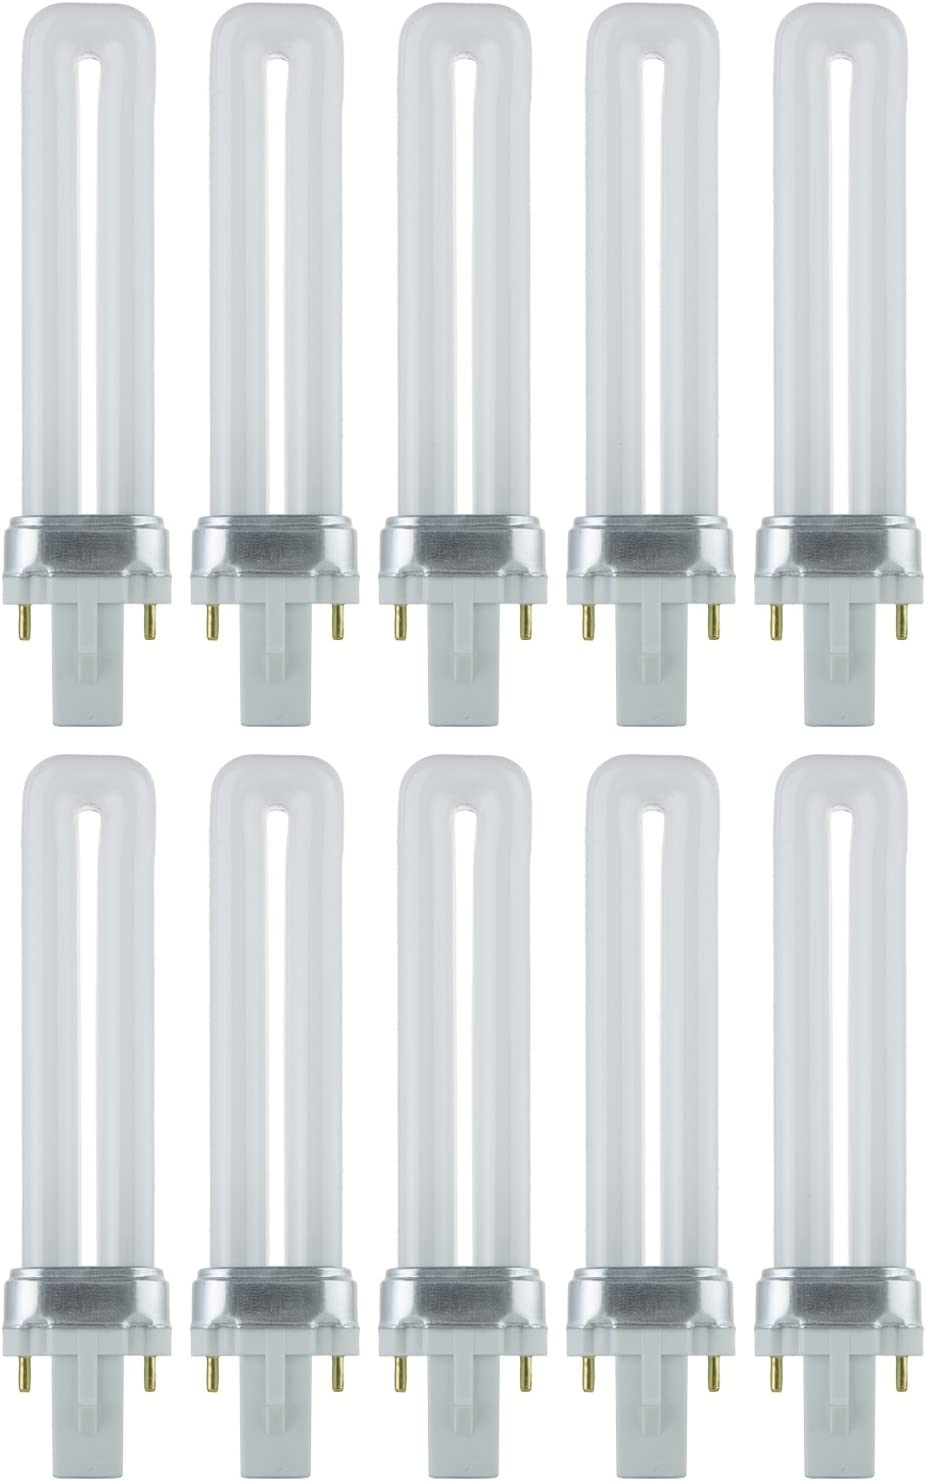 9 Watt Compact Fluorescent Bulb with G23 Base 4100K Color Temperature 10 Units